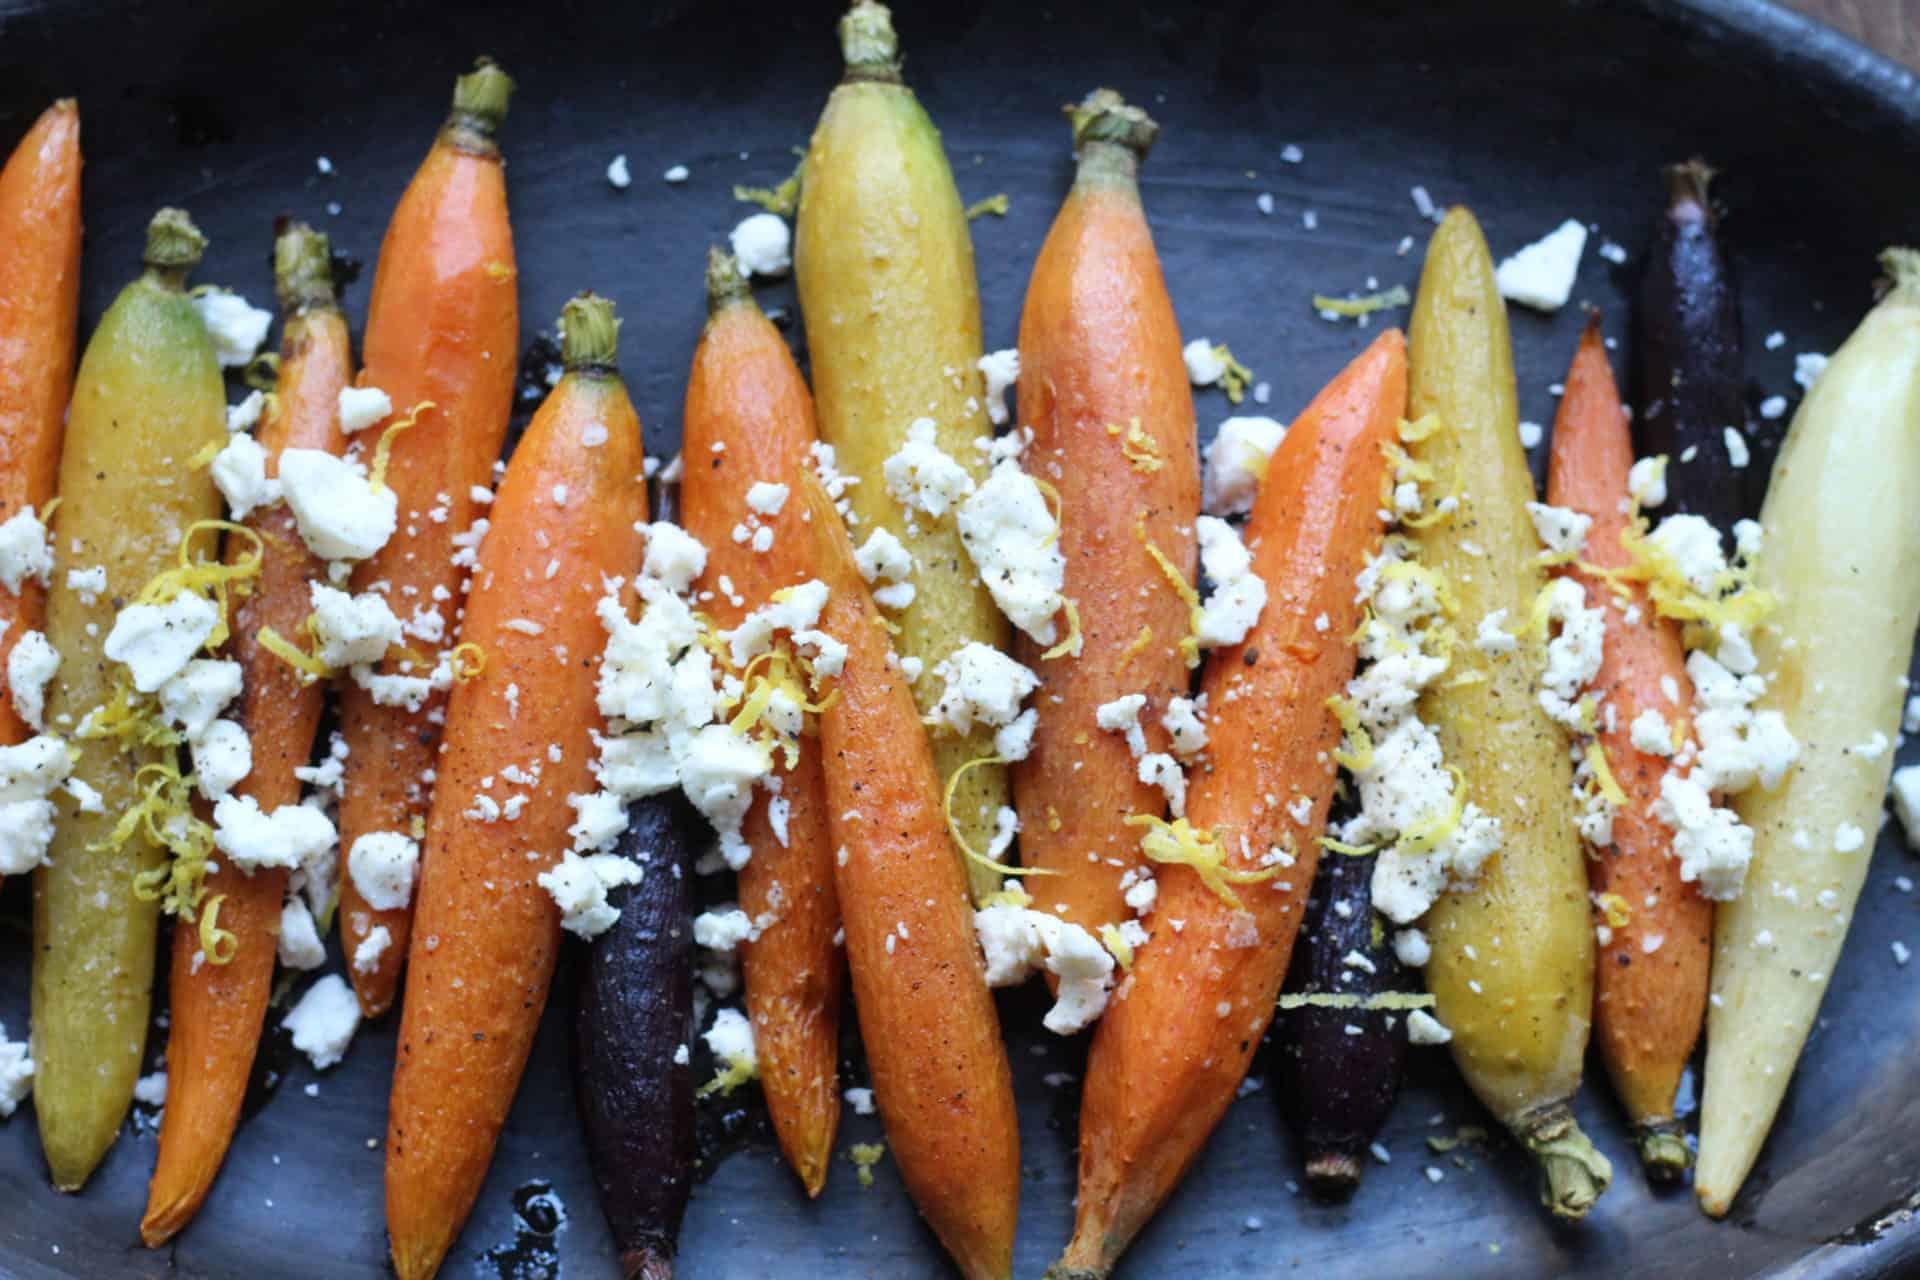 roasted rainbow carrots with feta lemon and truffle oil